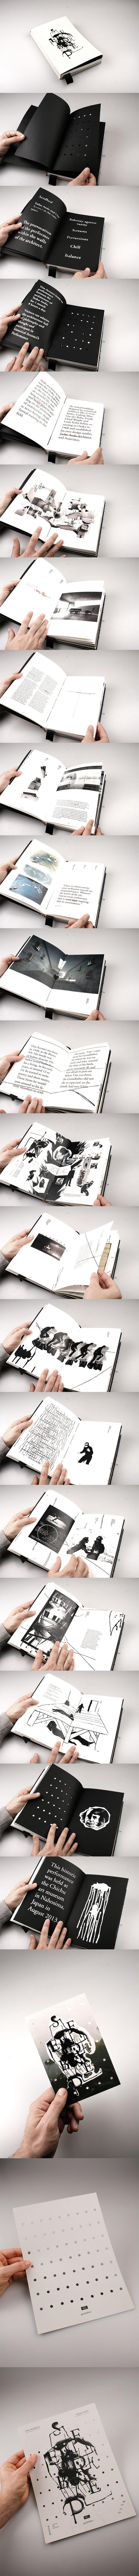 Art Book Tadao Ando VS Vito Acconci Chichu art Museum 2013 Frän Alðnssön